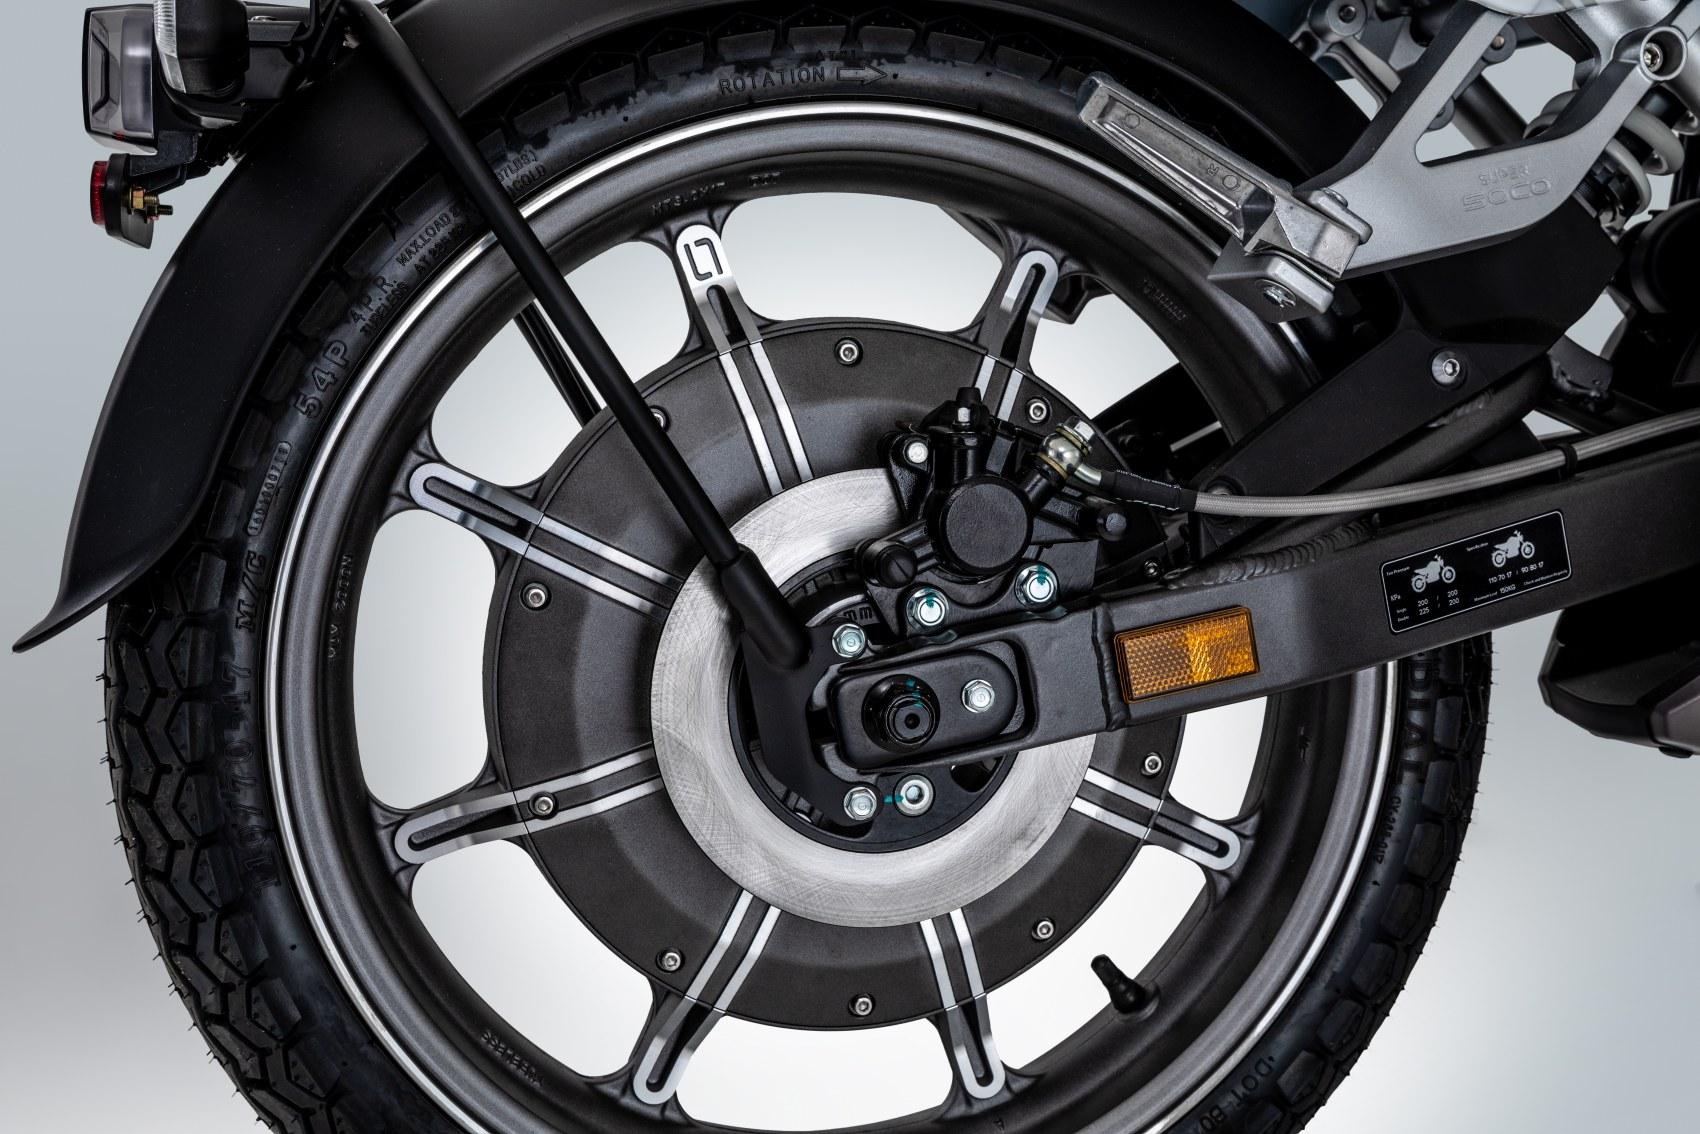 Super Soco TC electric motorcycle rear hub motor unit